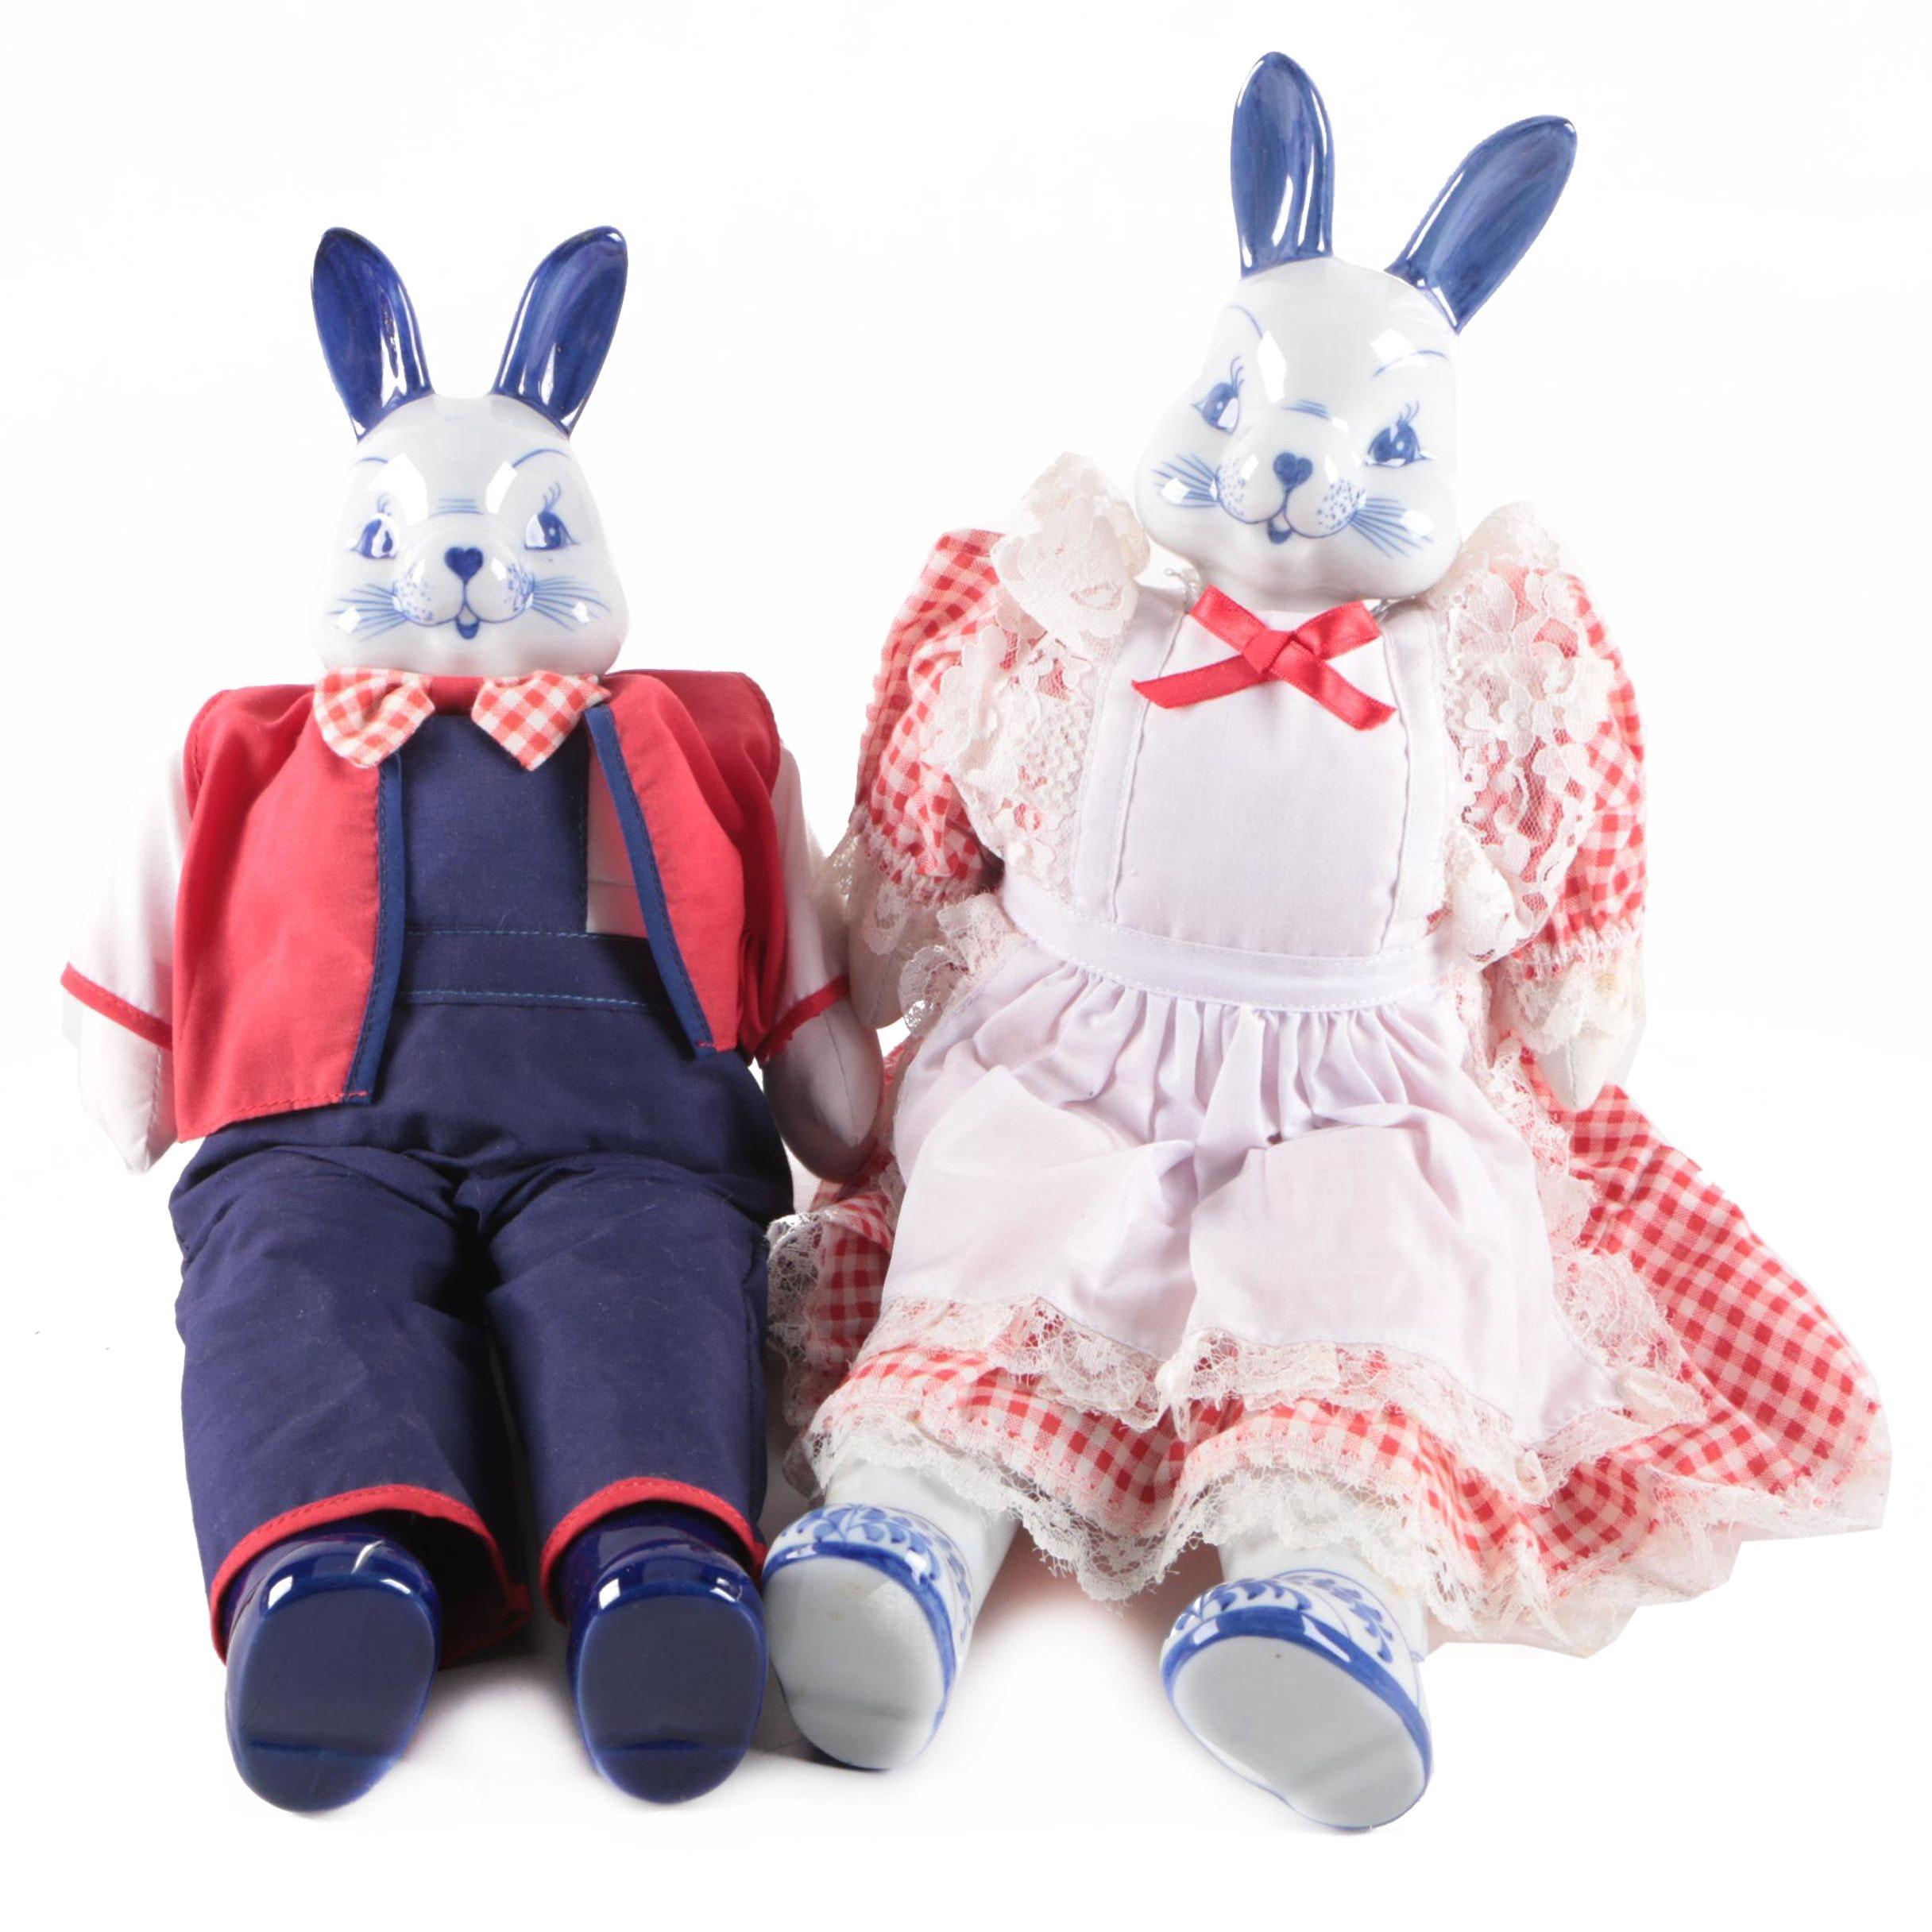 Vintage Hand-Painted Porcelain Bunny Dolls